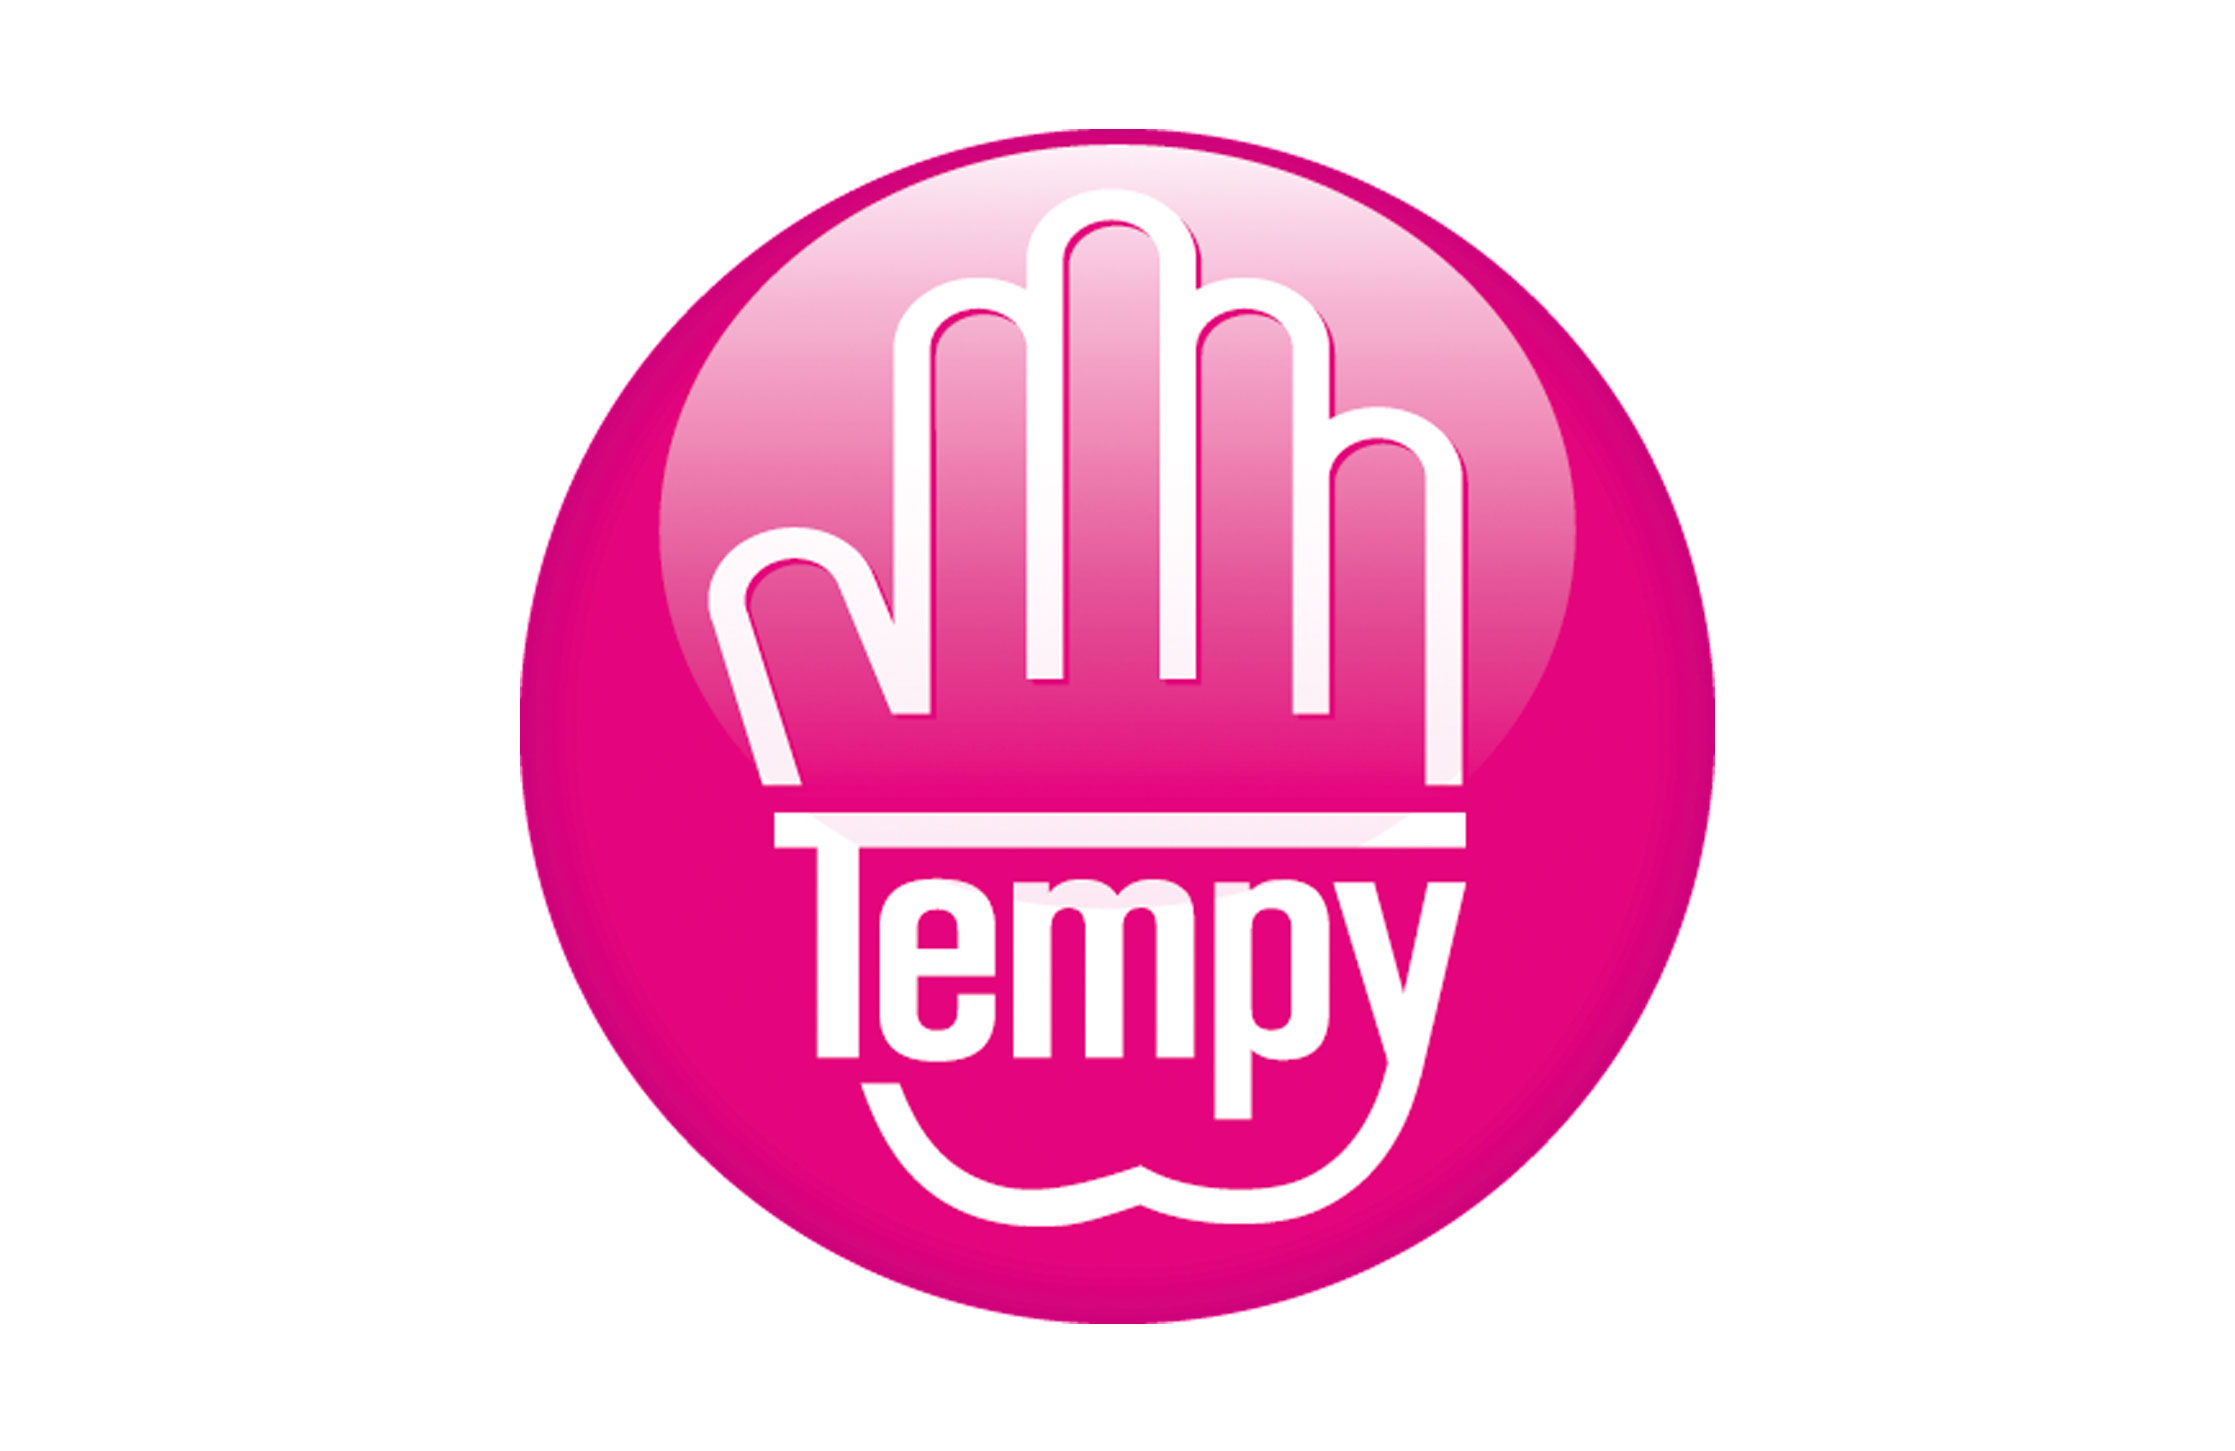 Tempy Mobile application Logo